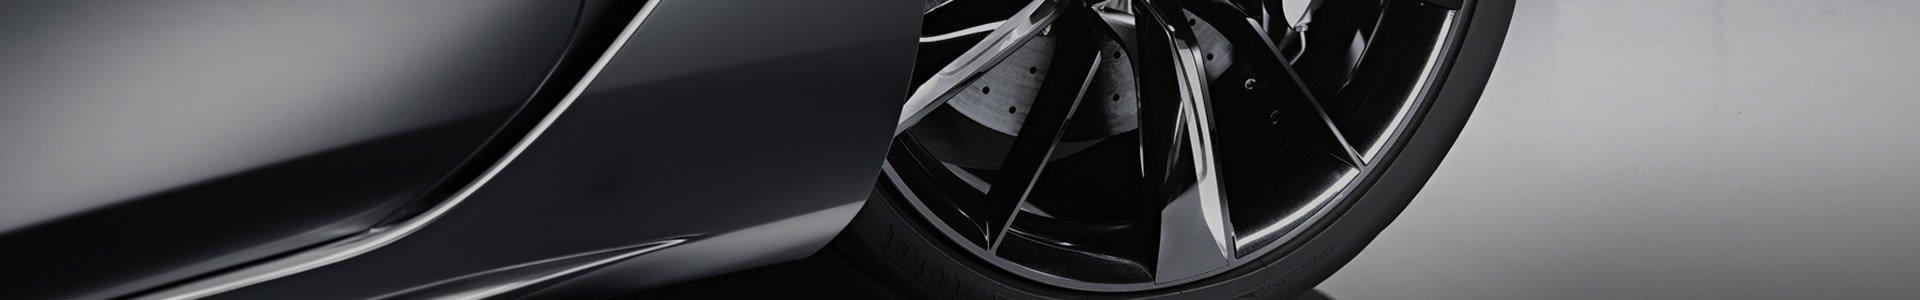 Tuowei Aluminum Alloy Cavity Prototype Aluminum Alloy Prototype image20